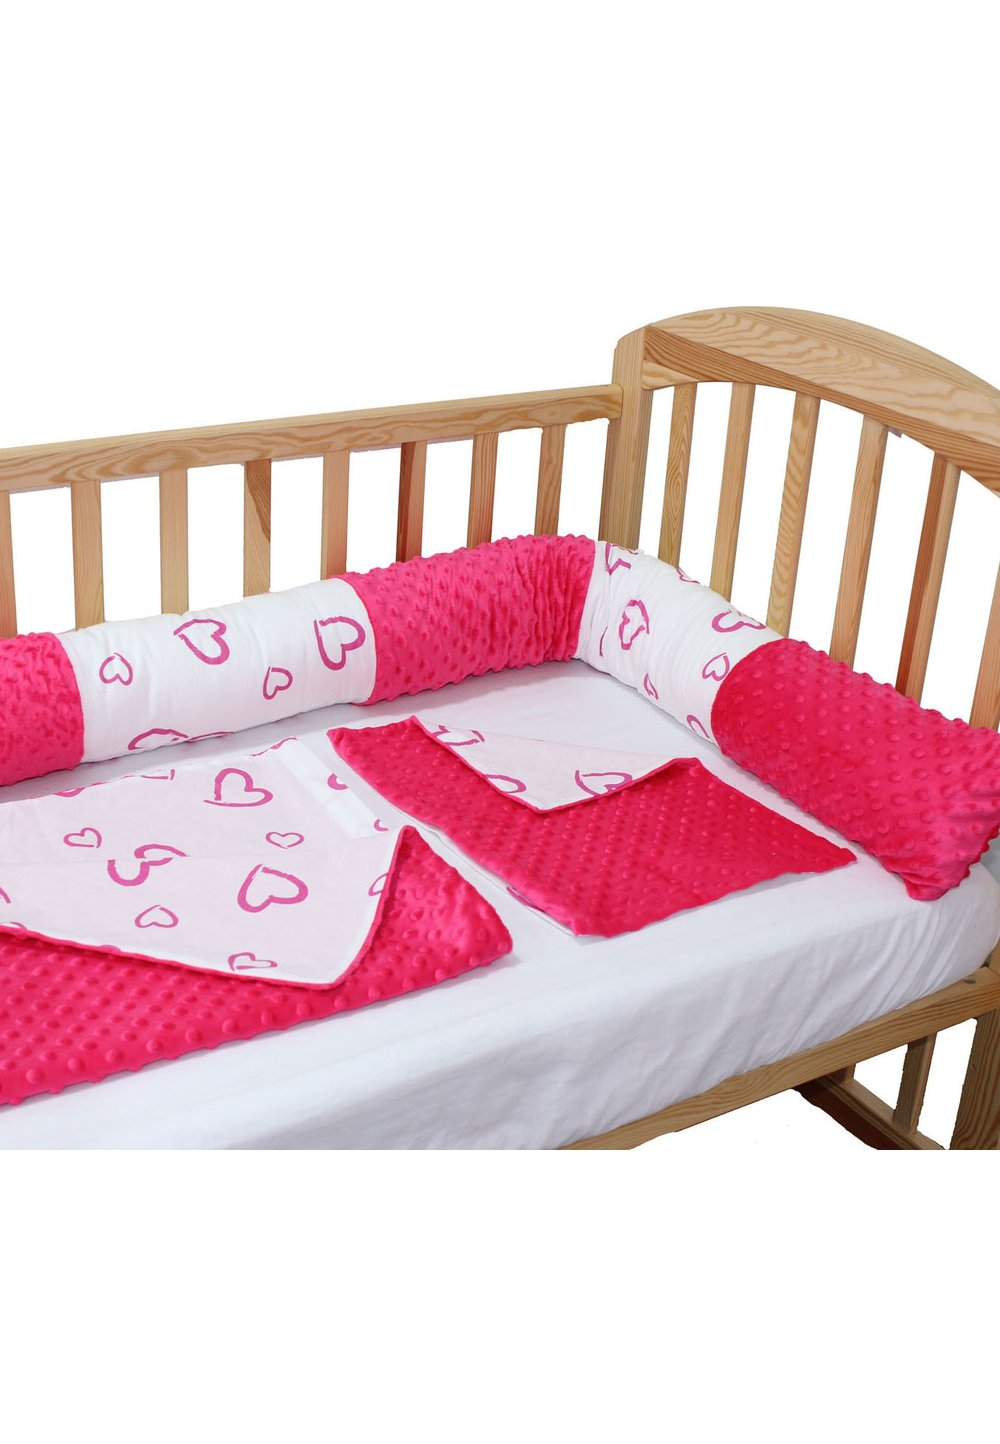 Lenjerie 5 piese, cu bumper, roz inchis, inimioare, 120 x 60 cm imagine